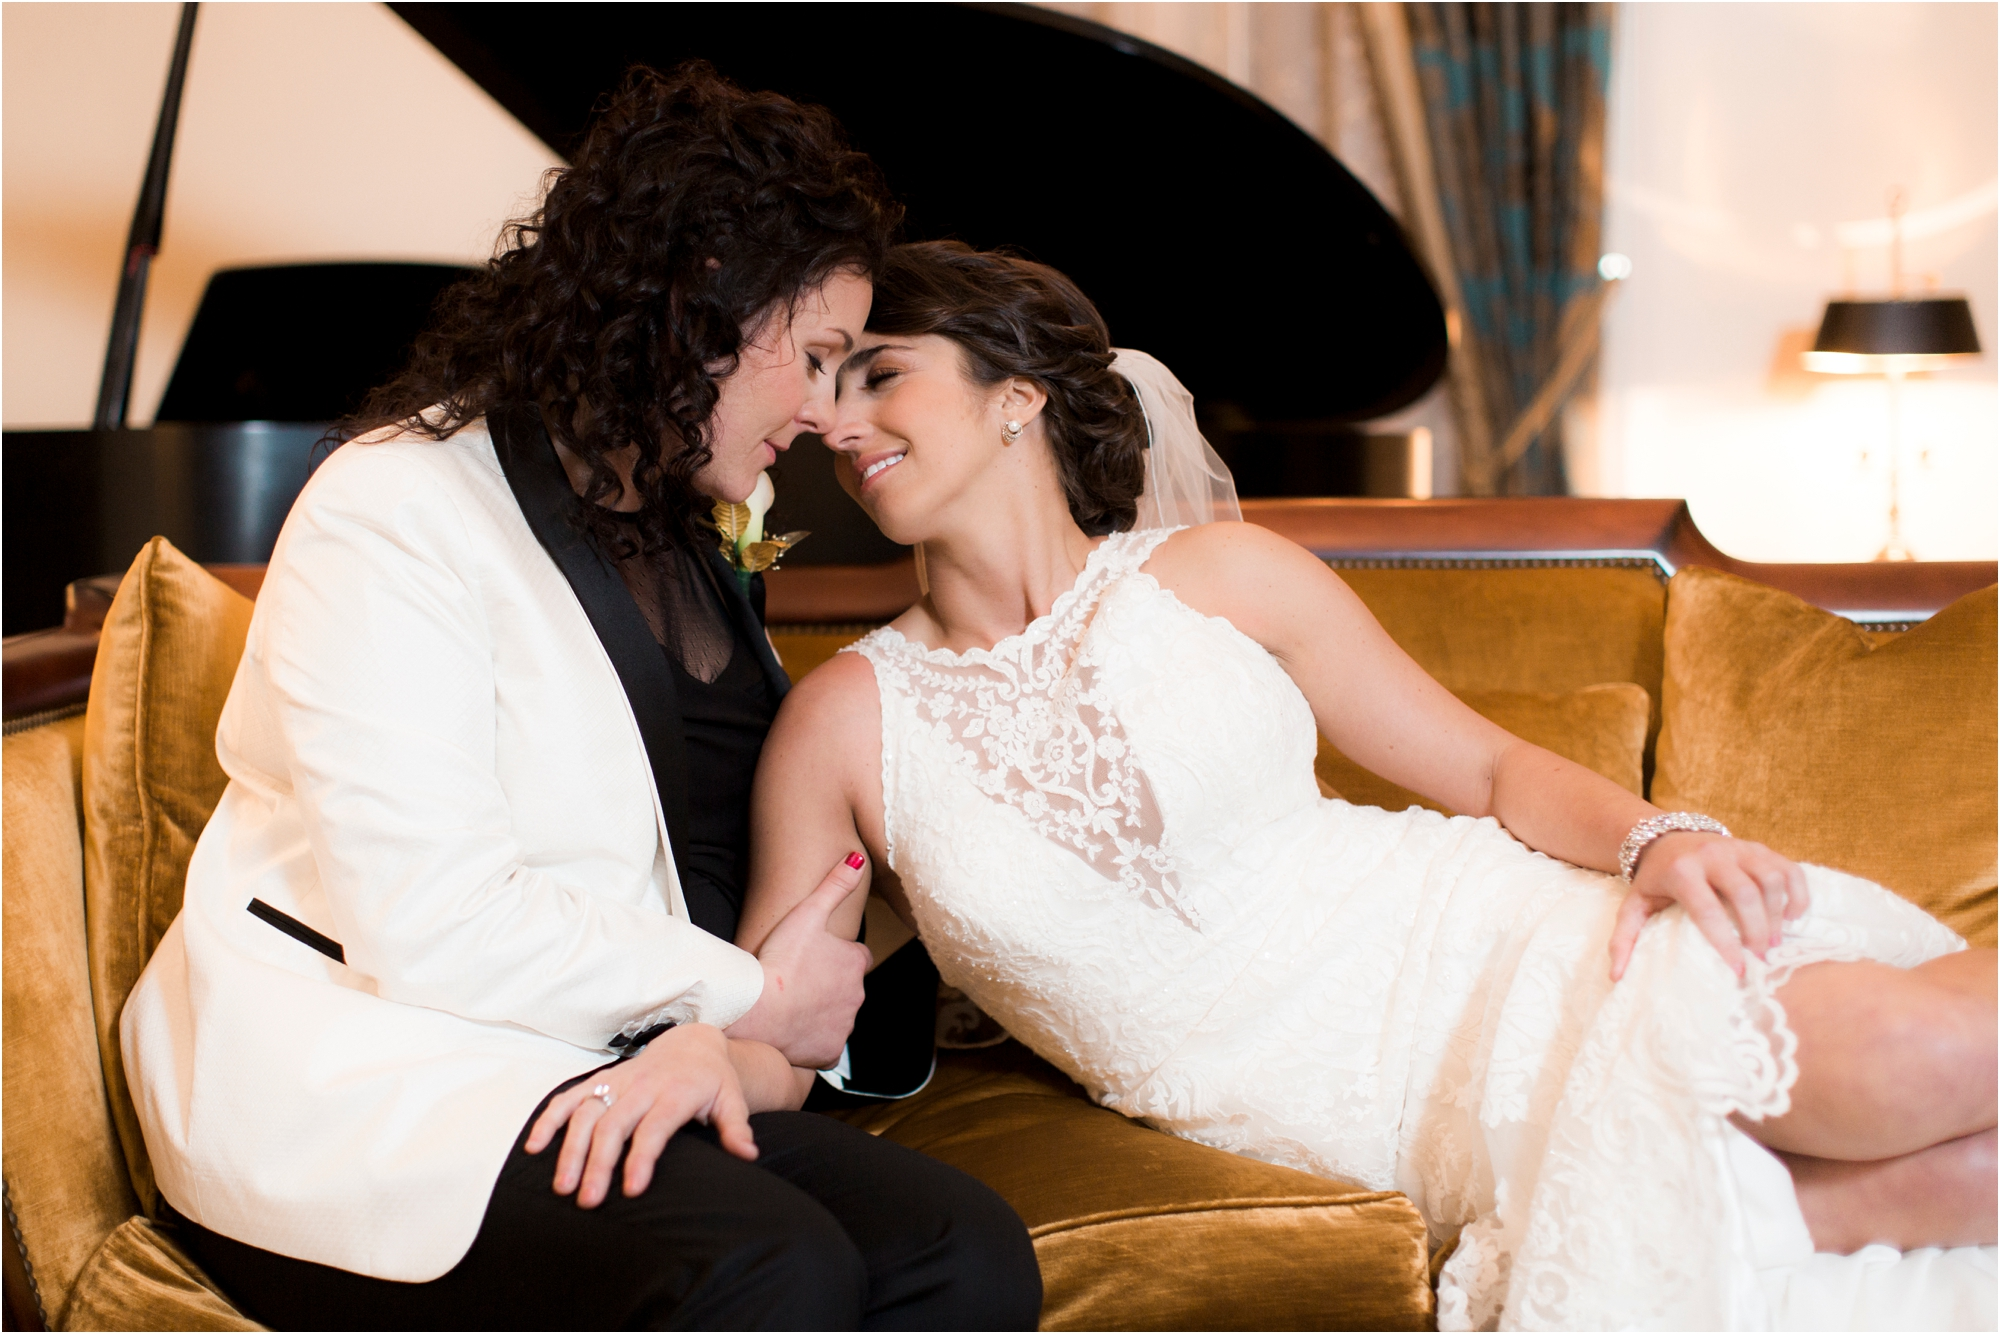 phoebe-mayme-richmond-virginia-colorful-love-is-love-wedding-photos_0016.jpg